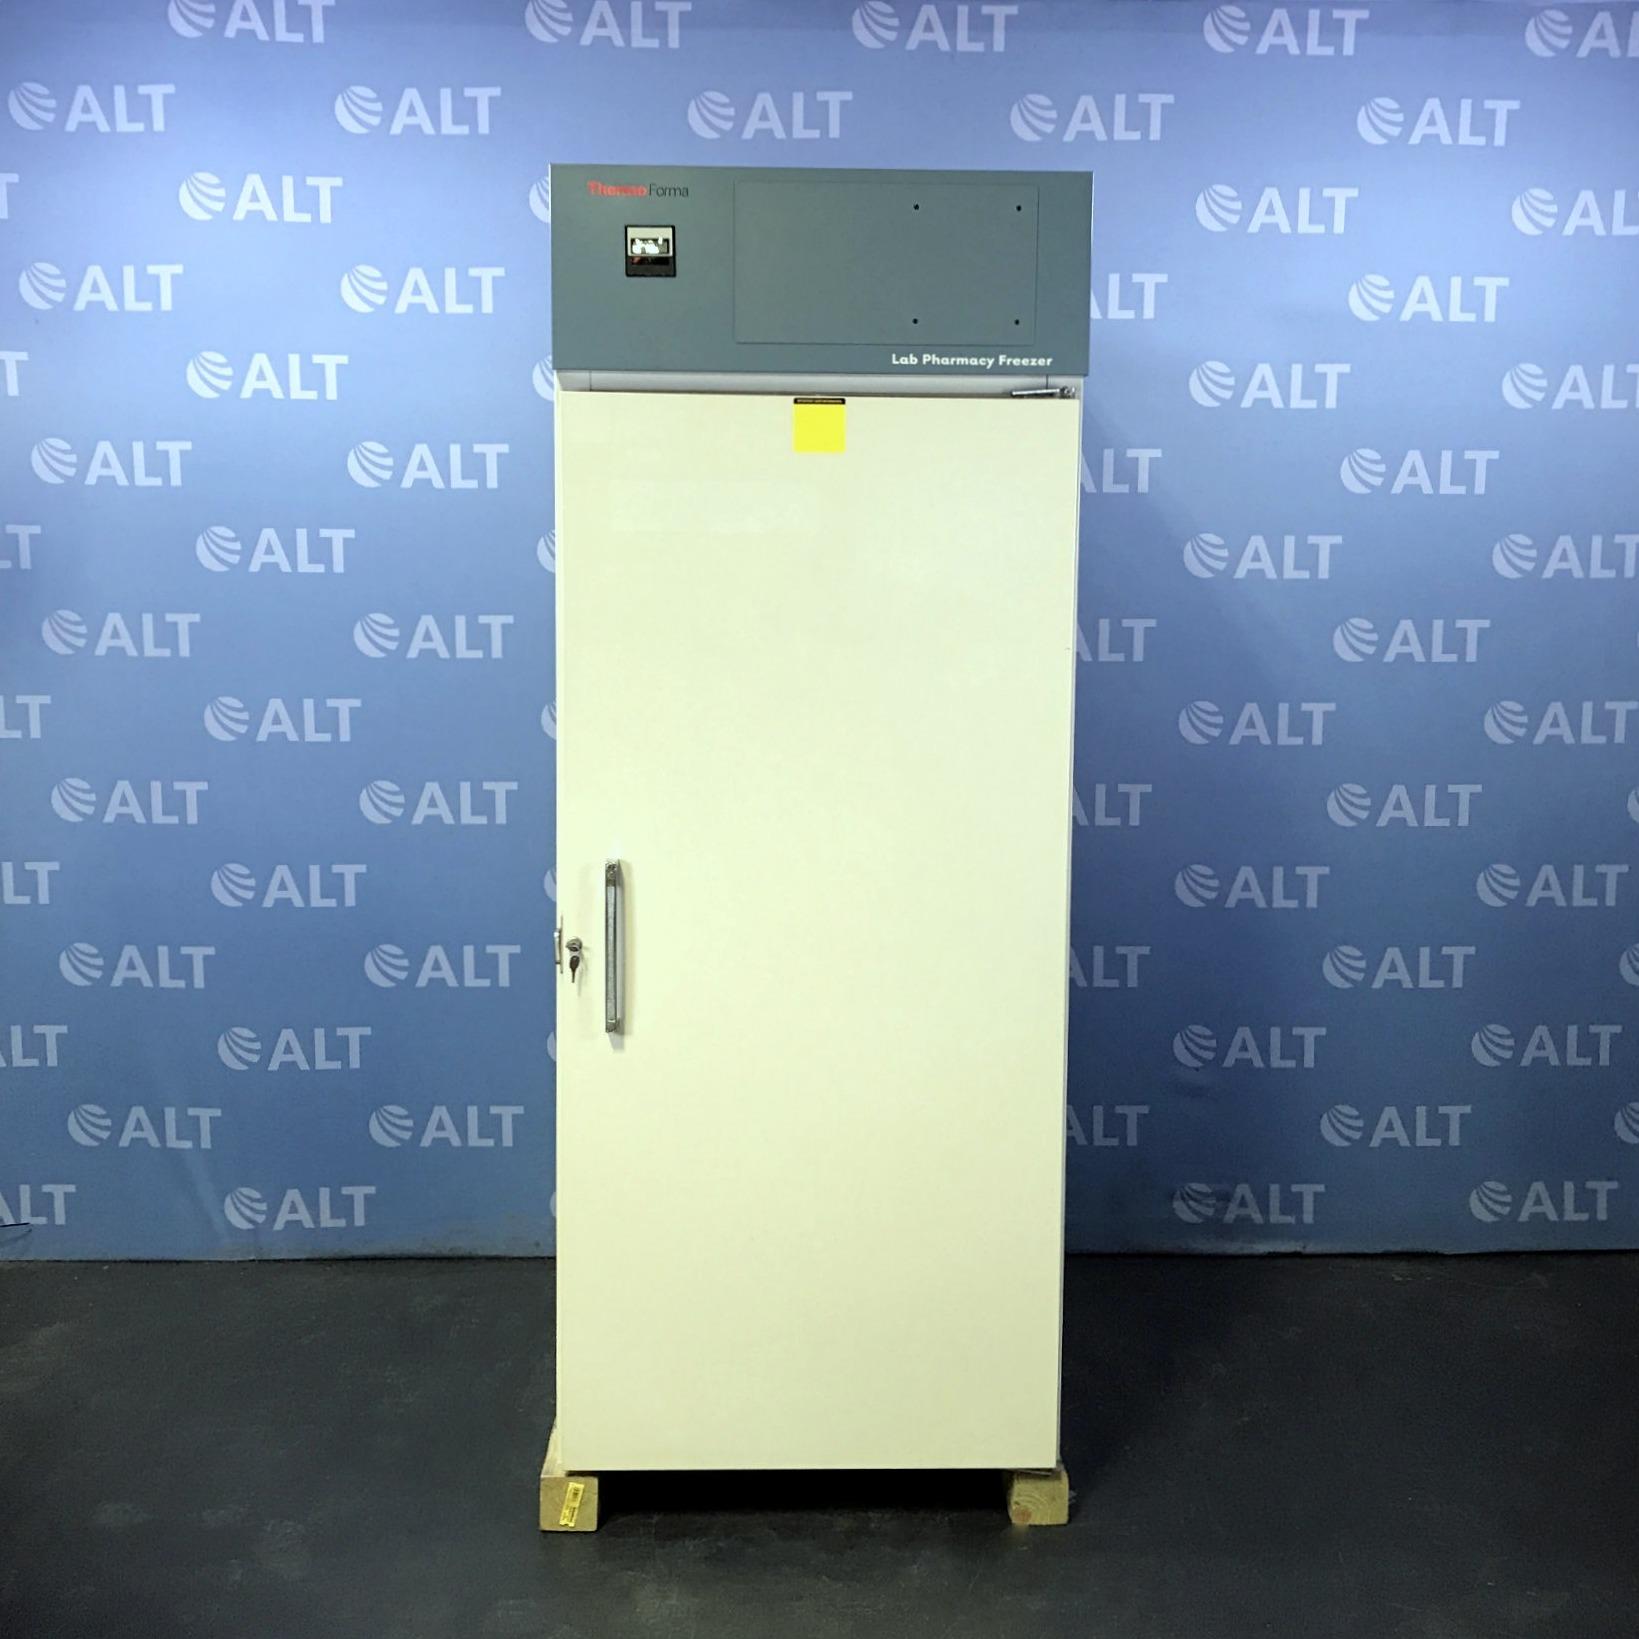 Model 3801 Lab Pharmacy Freezer Name